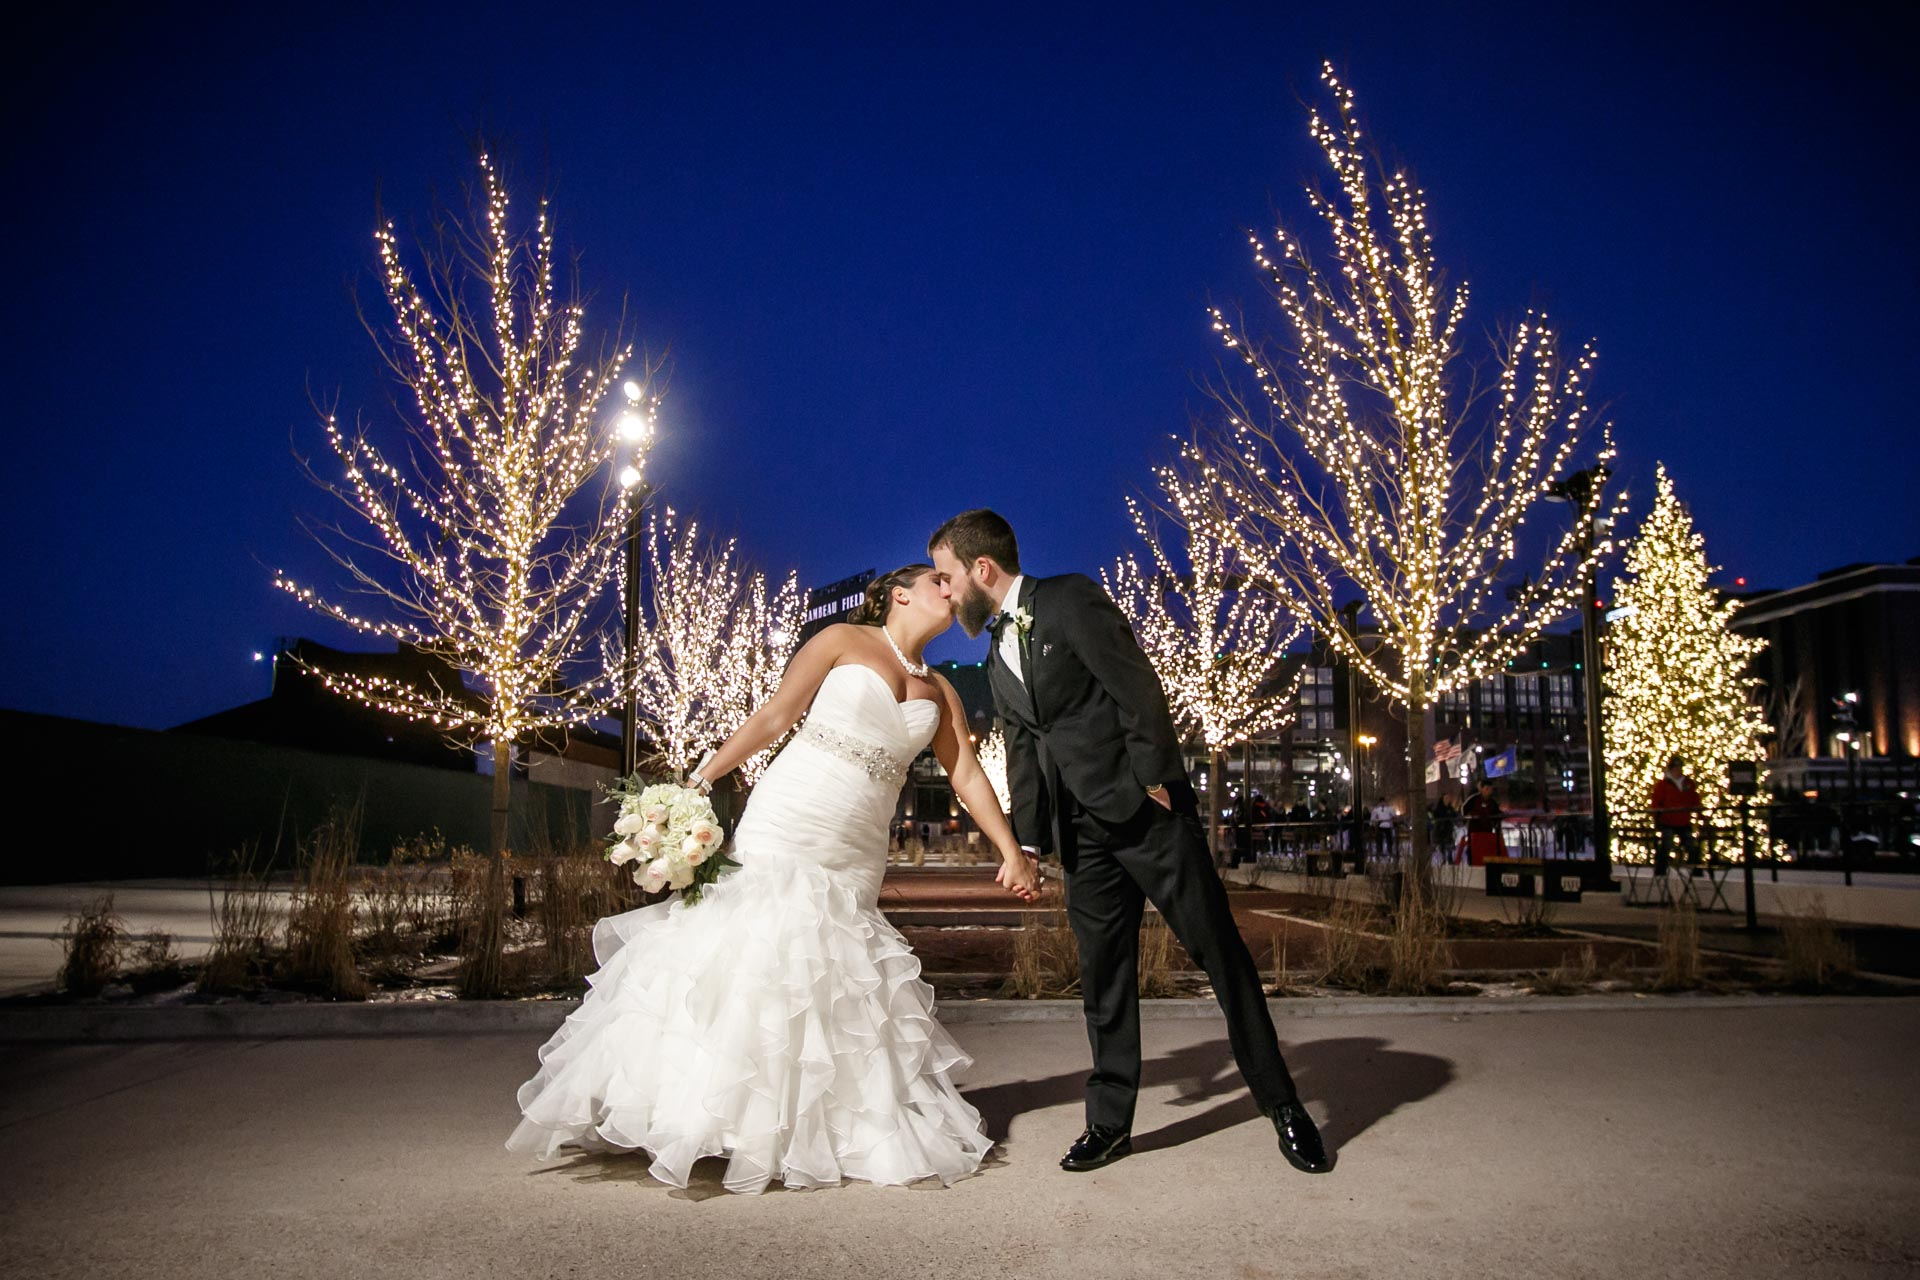 wedding-2-adam-shea-photography-green-bay-appleton-neenah-photographer-21.jpg